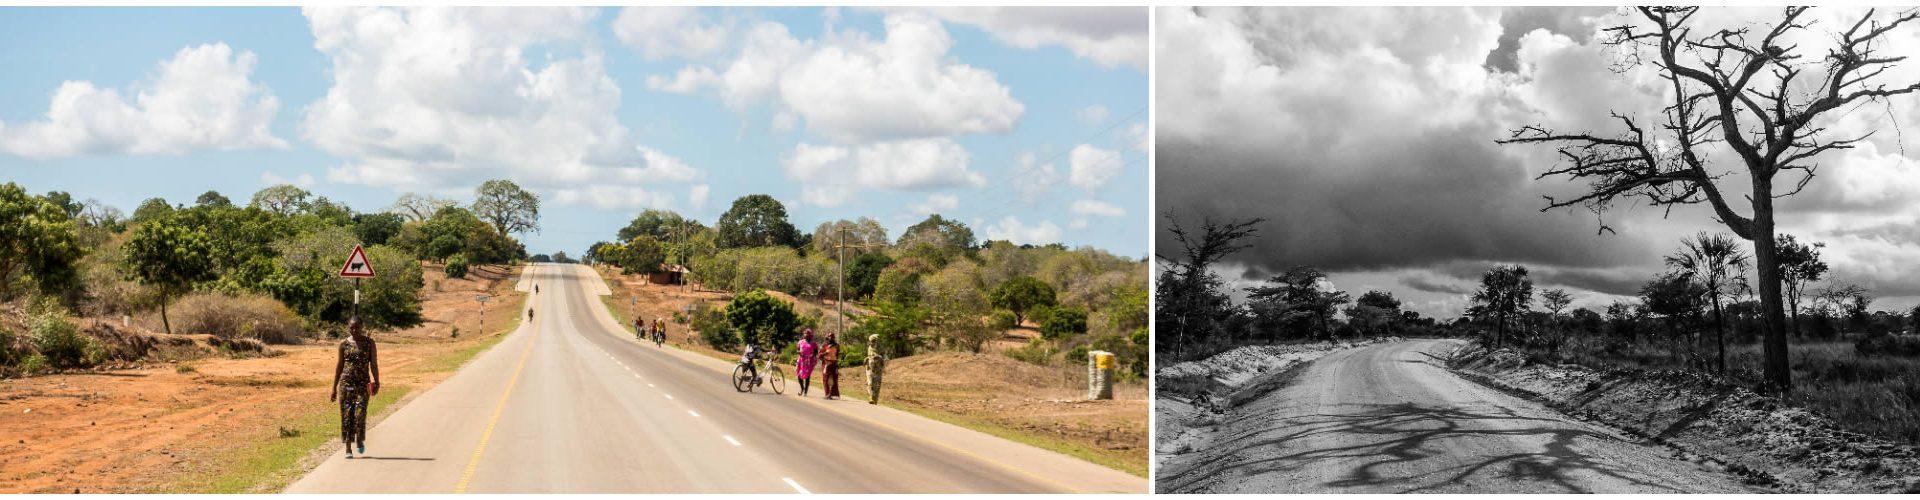 Statale per Dar es Salaam, Tanzania / Parco Nazionale Saadani